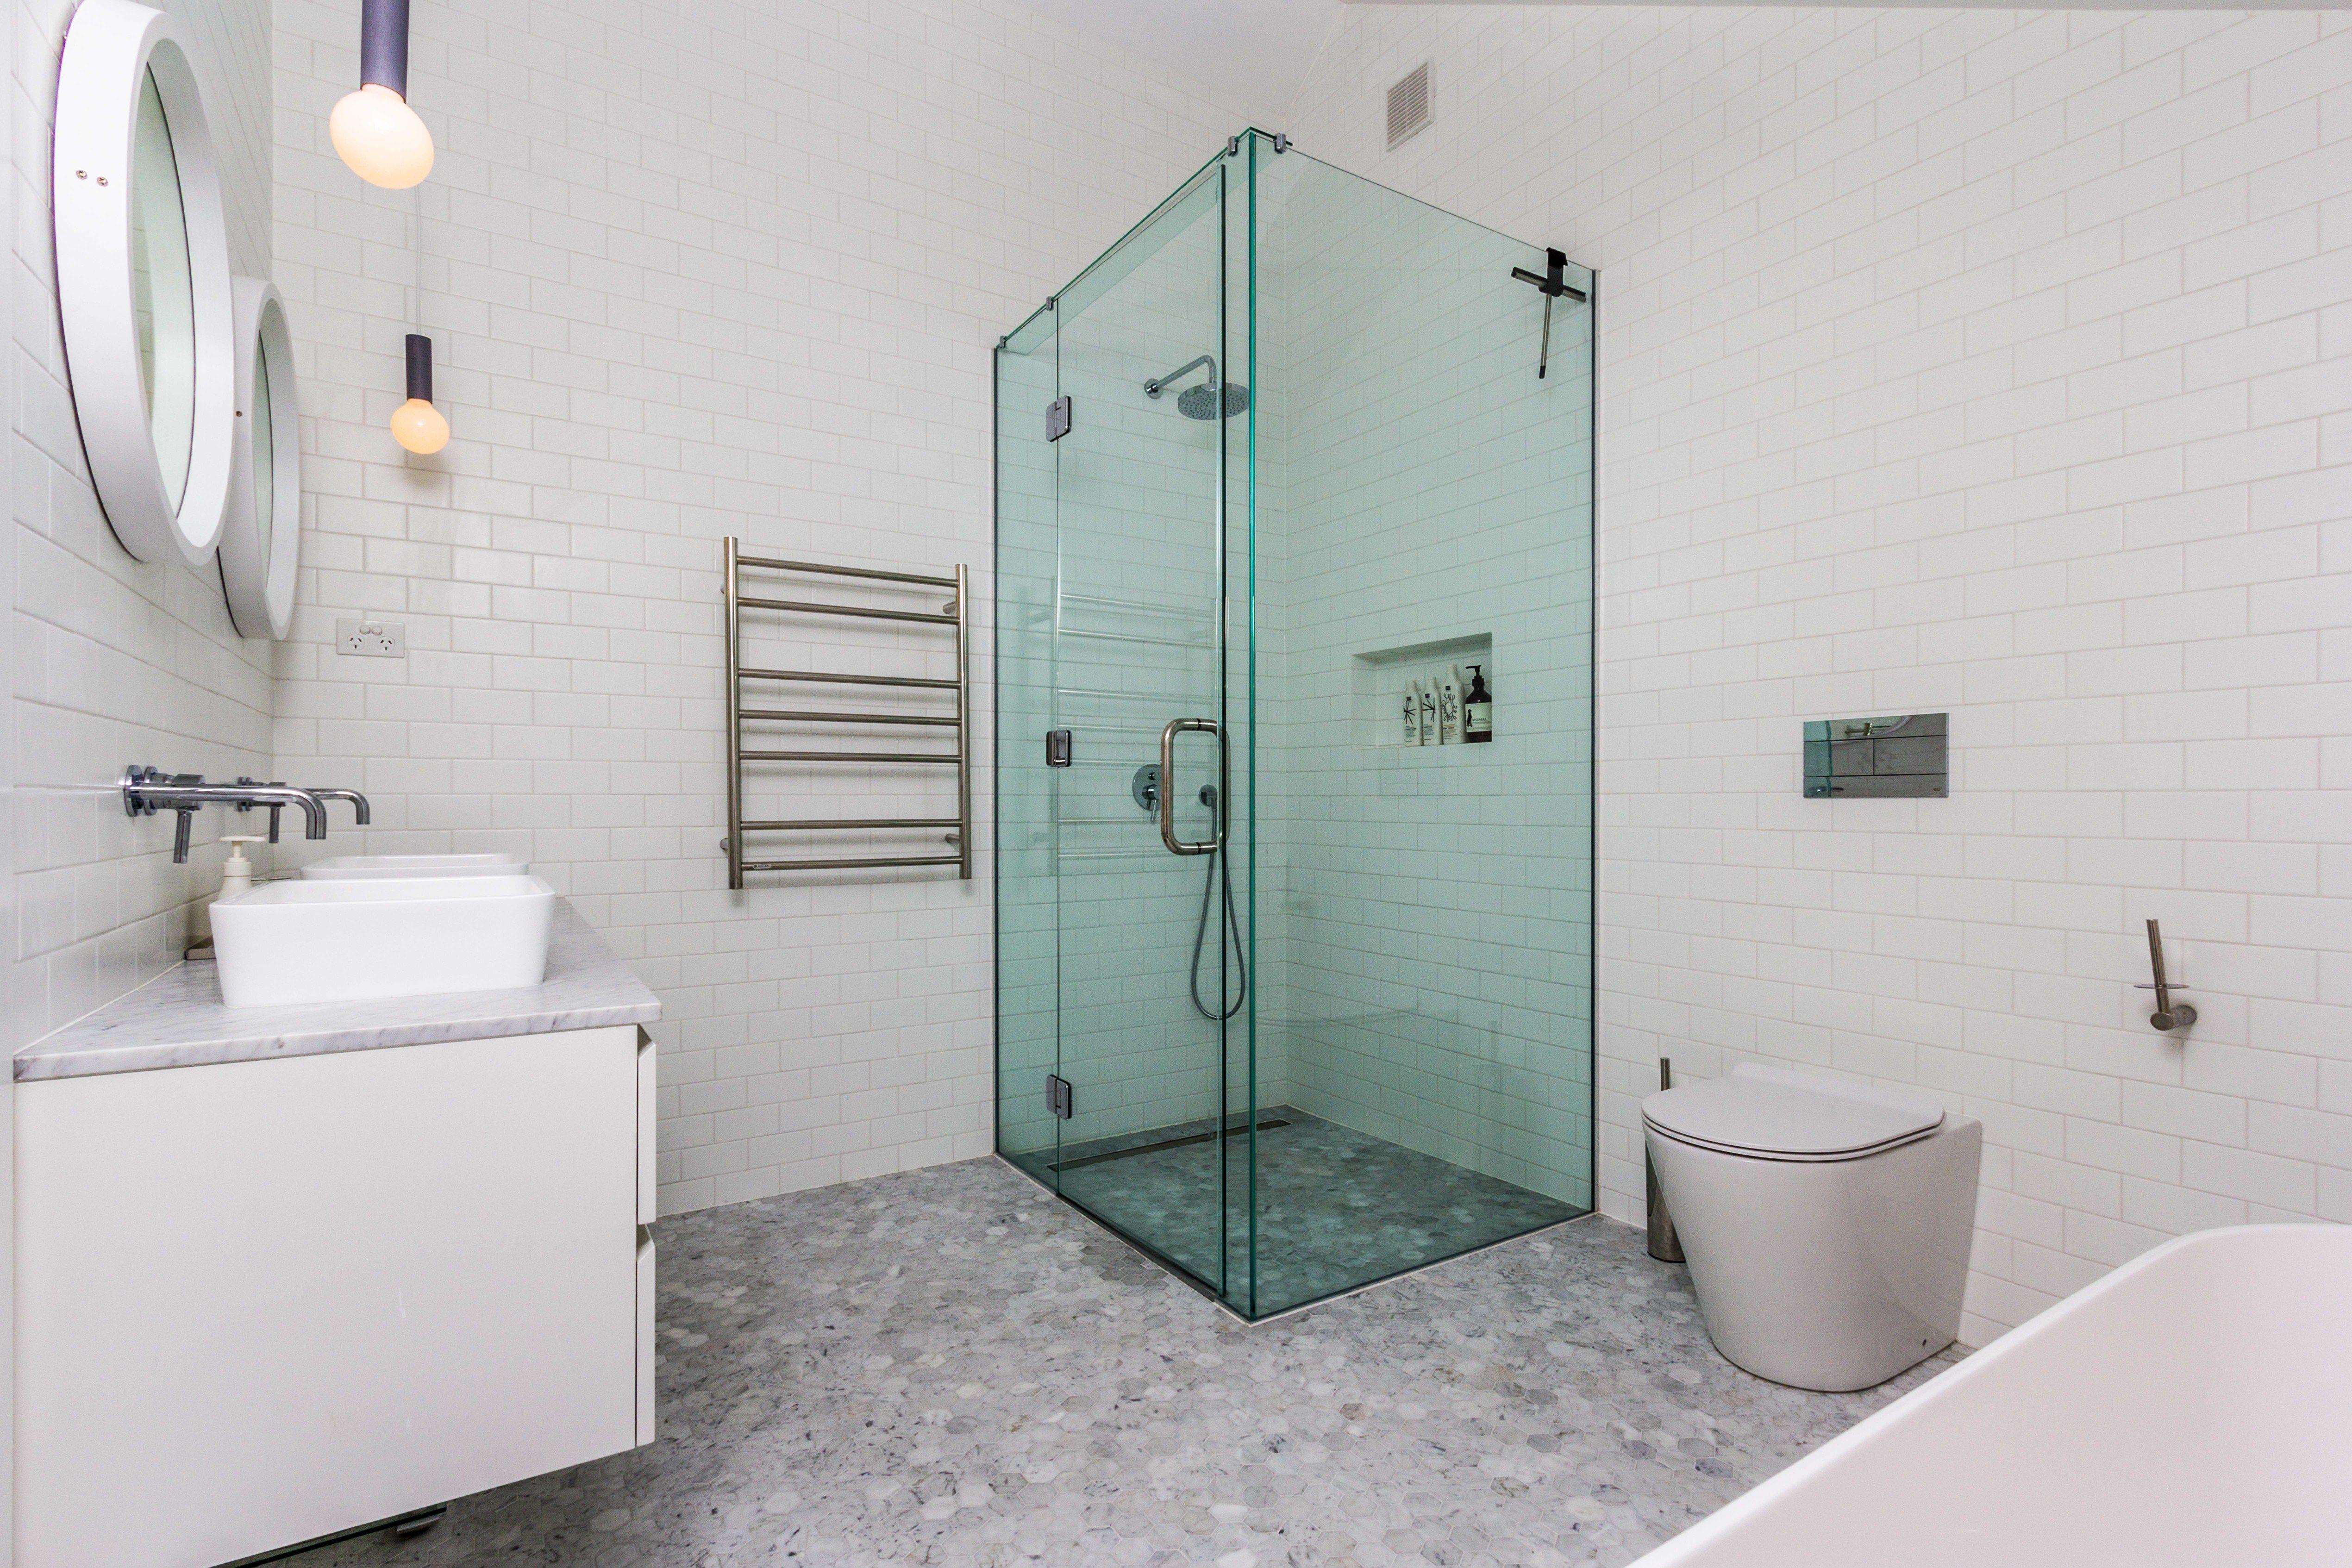 Bathroom Project Details Location Millais Street, Grey Lynn Category Renovation